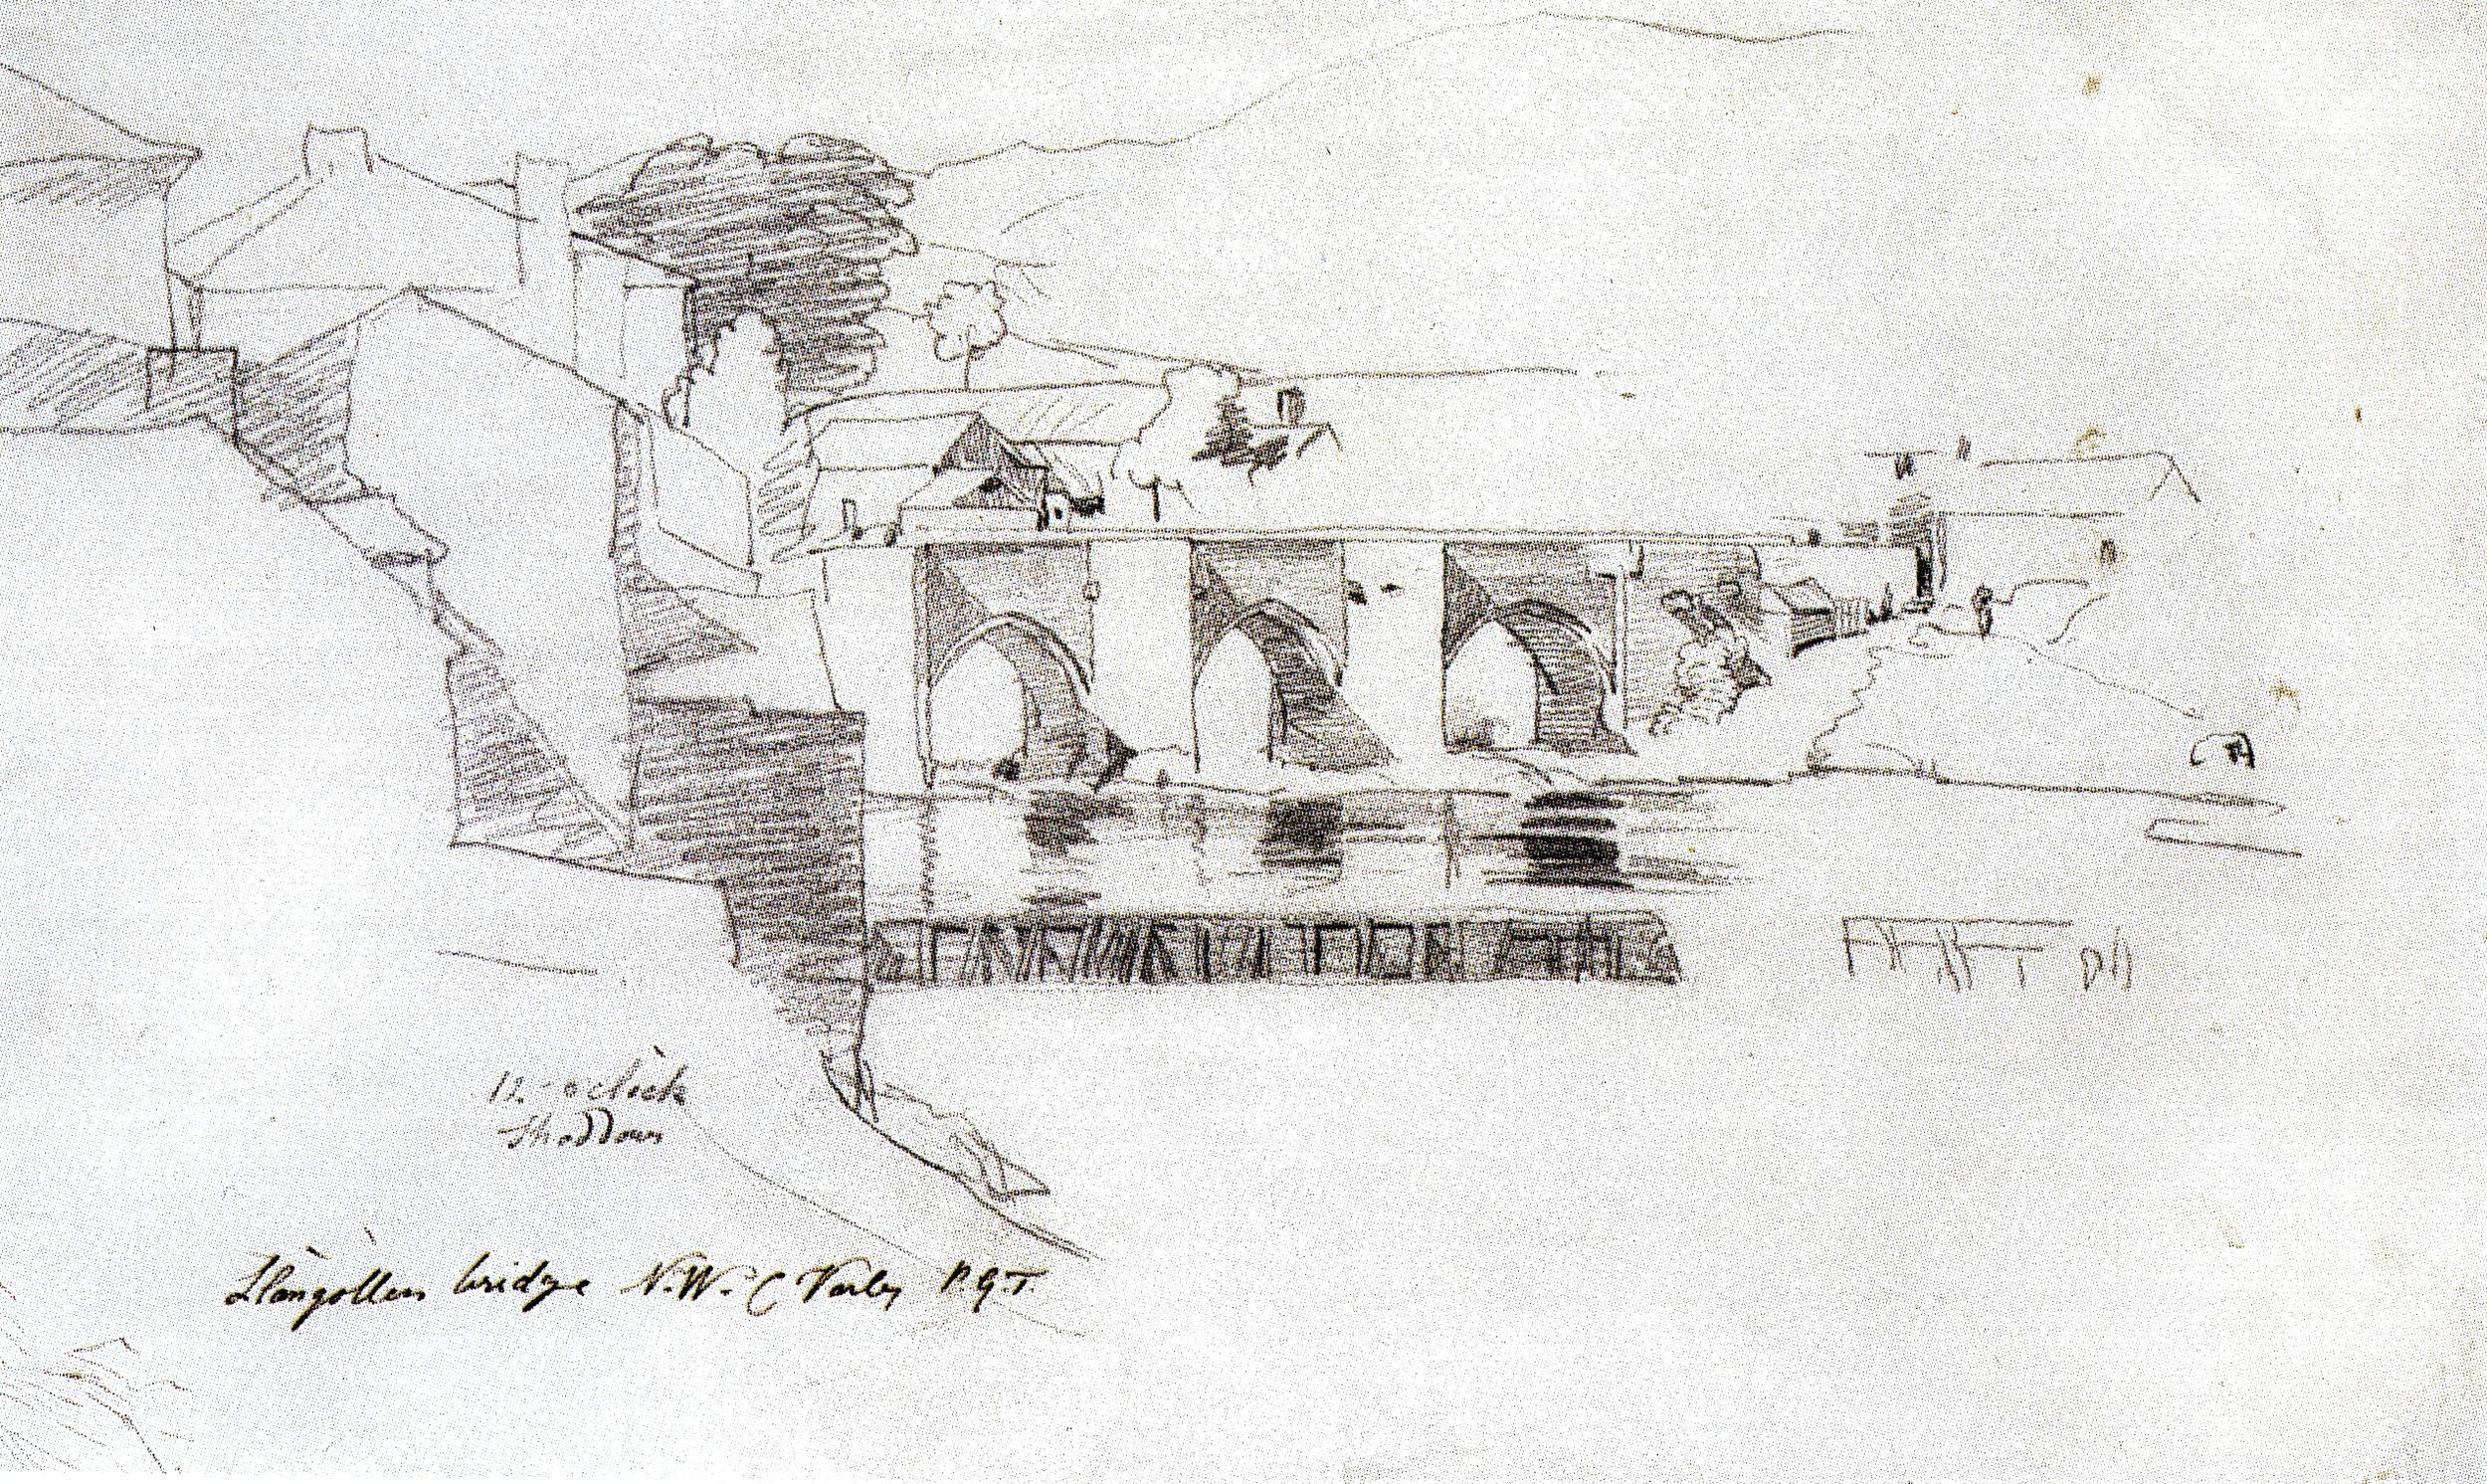 Cornelius Varley, Llangollen Bridge, North Wales (1818)